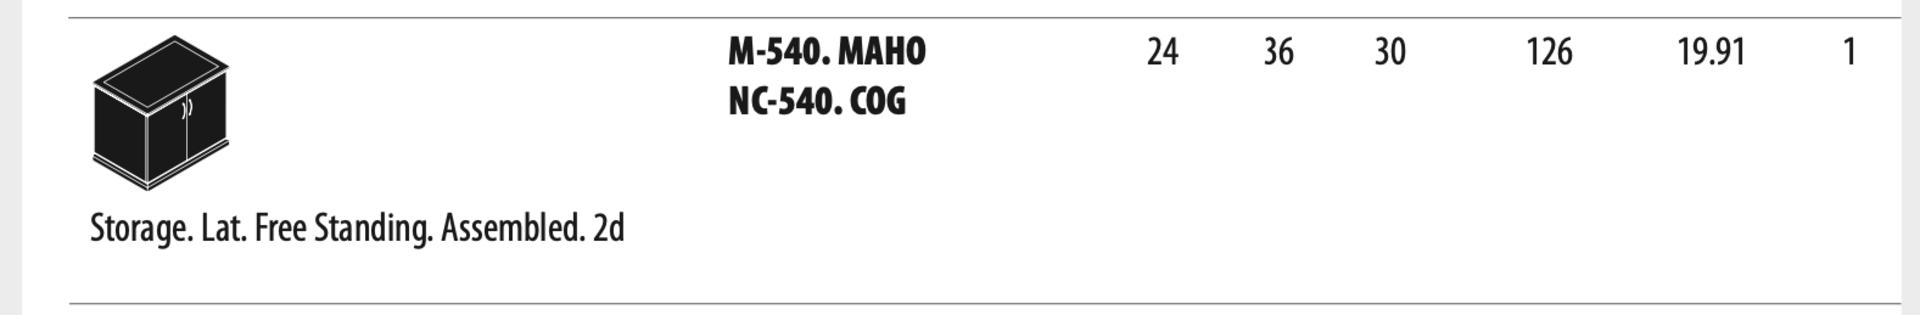 (3) Cherryman Emerald Collection Mahogany Storage Lat. Free Standing Assembled. (M540) (List price - Image 2 of 2